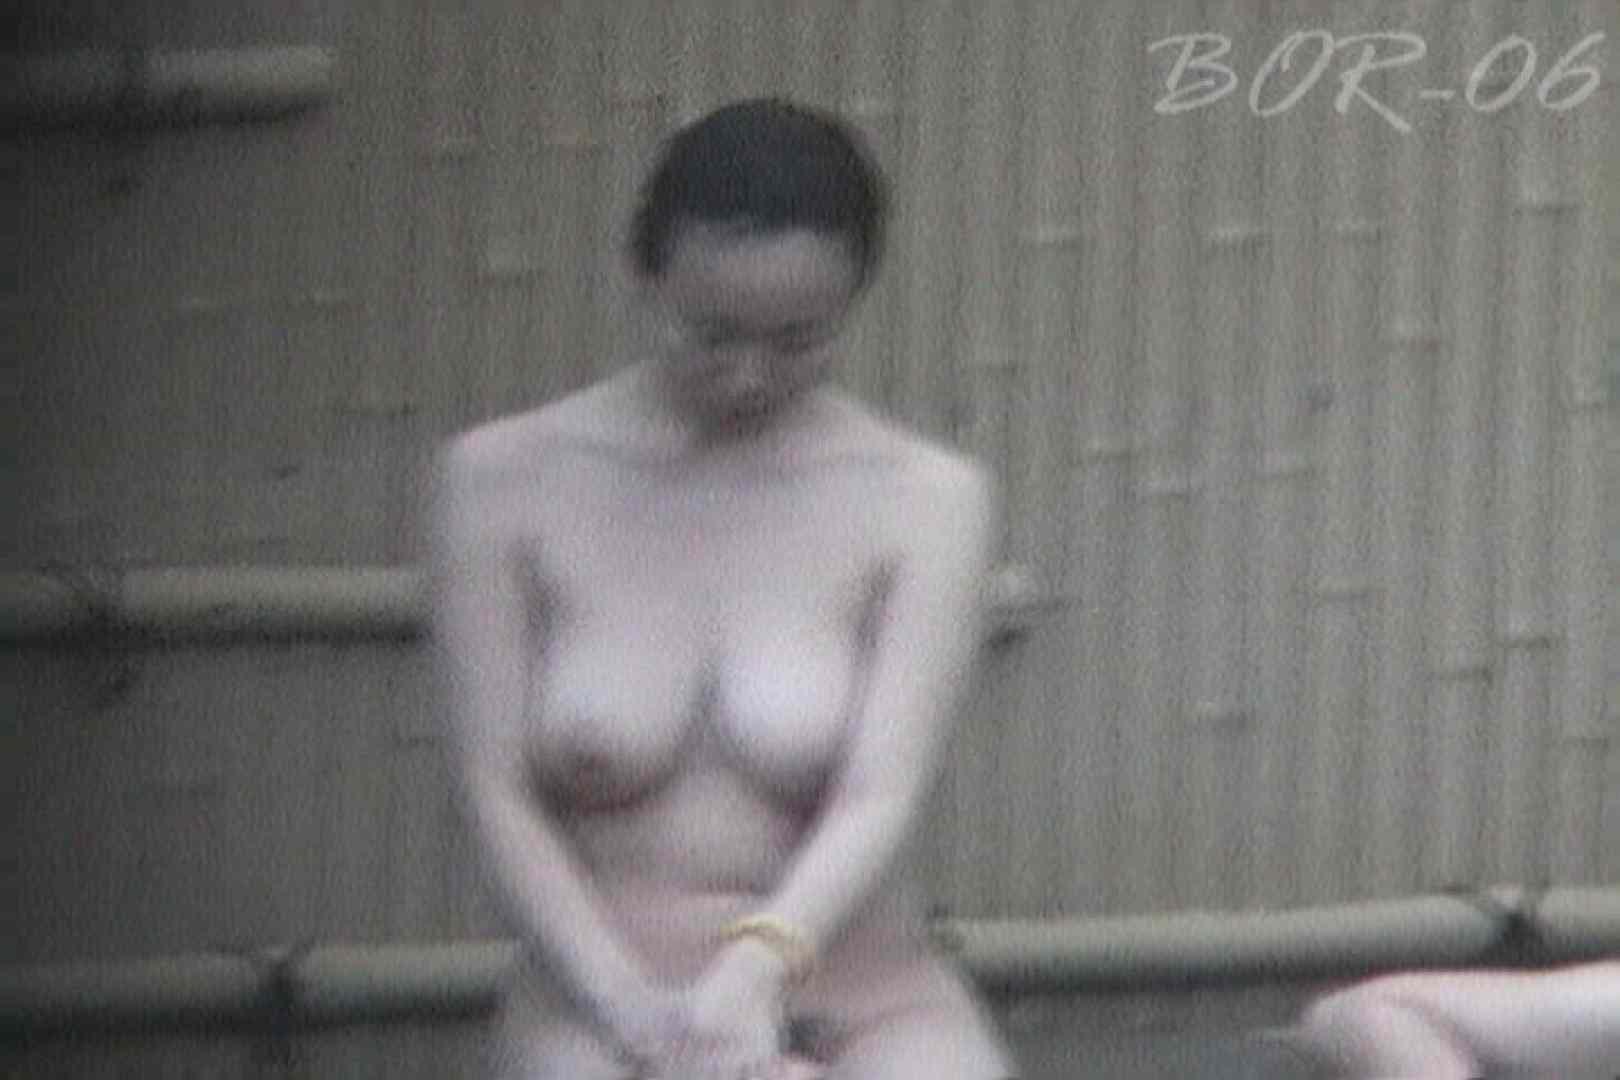 Aquaな露天風呂Vol.519 露天風呂突入 のぞき動画画像 102pic 65